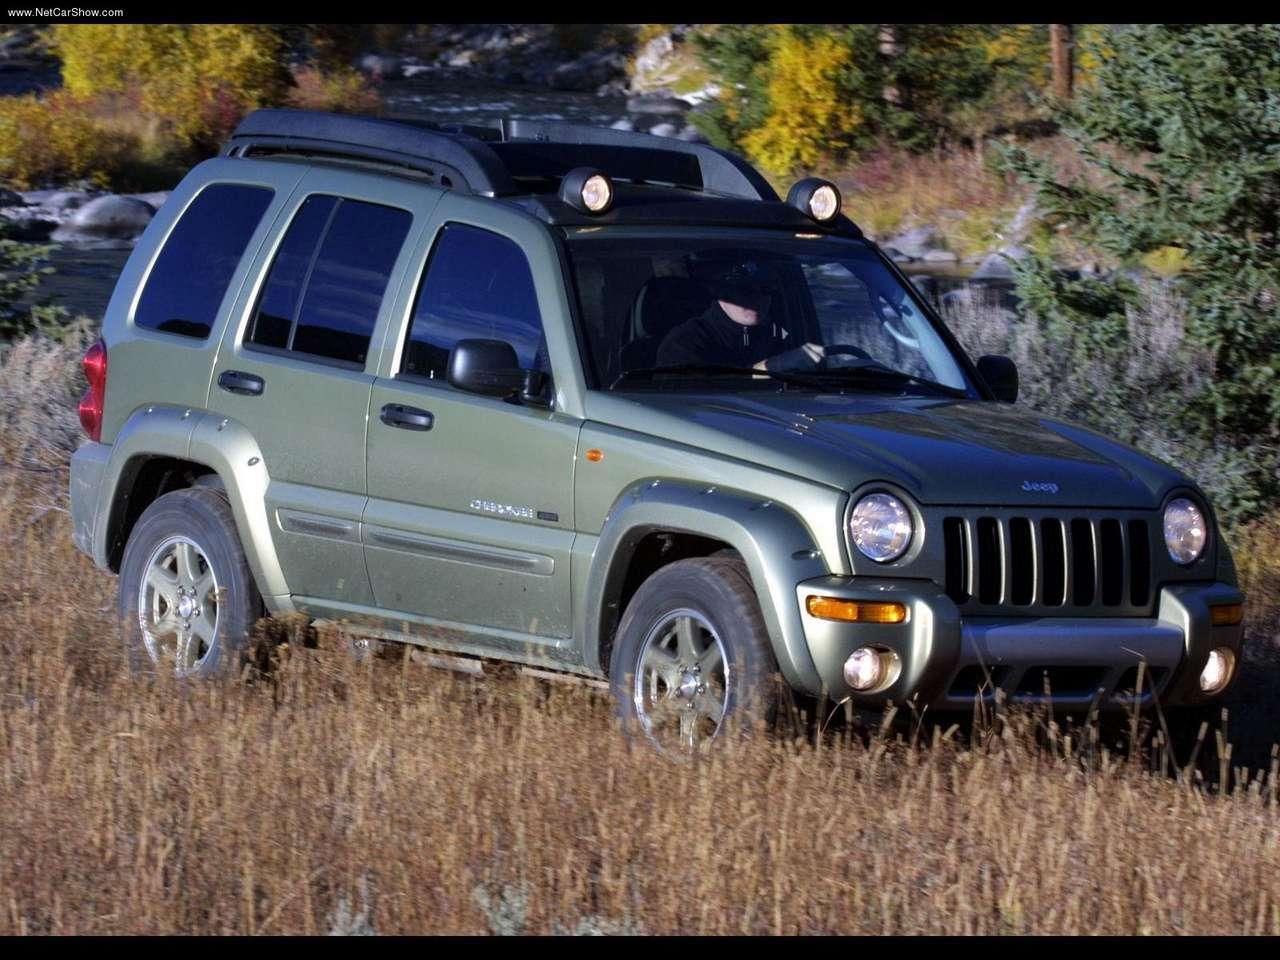 Jeep-Cherokee_Renegade-2003-1280-09.jpg